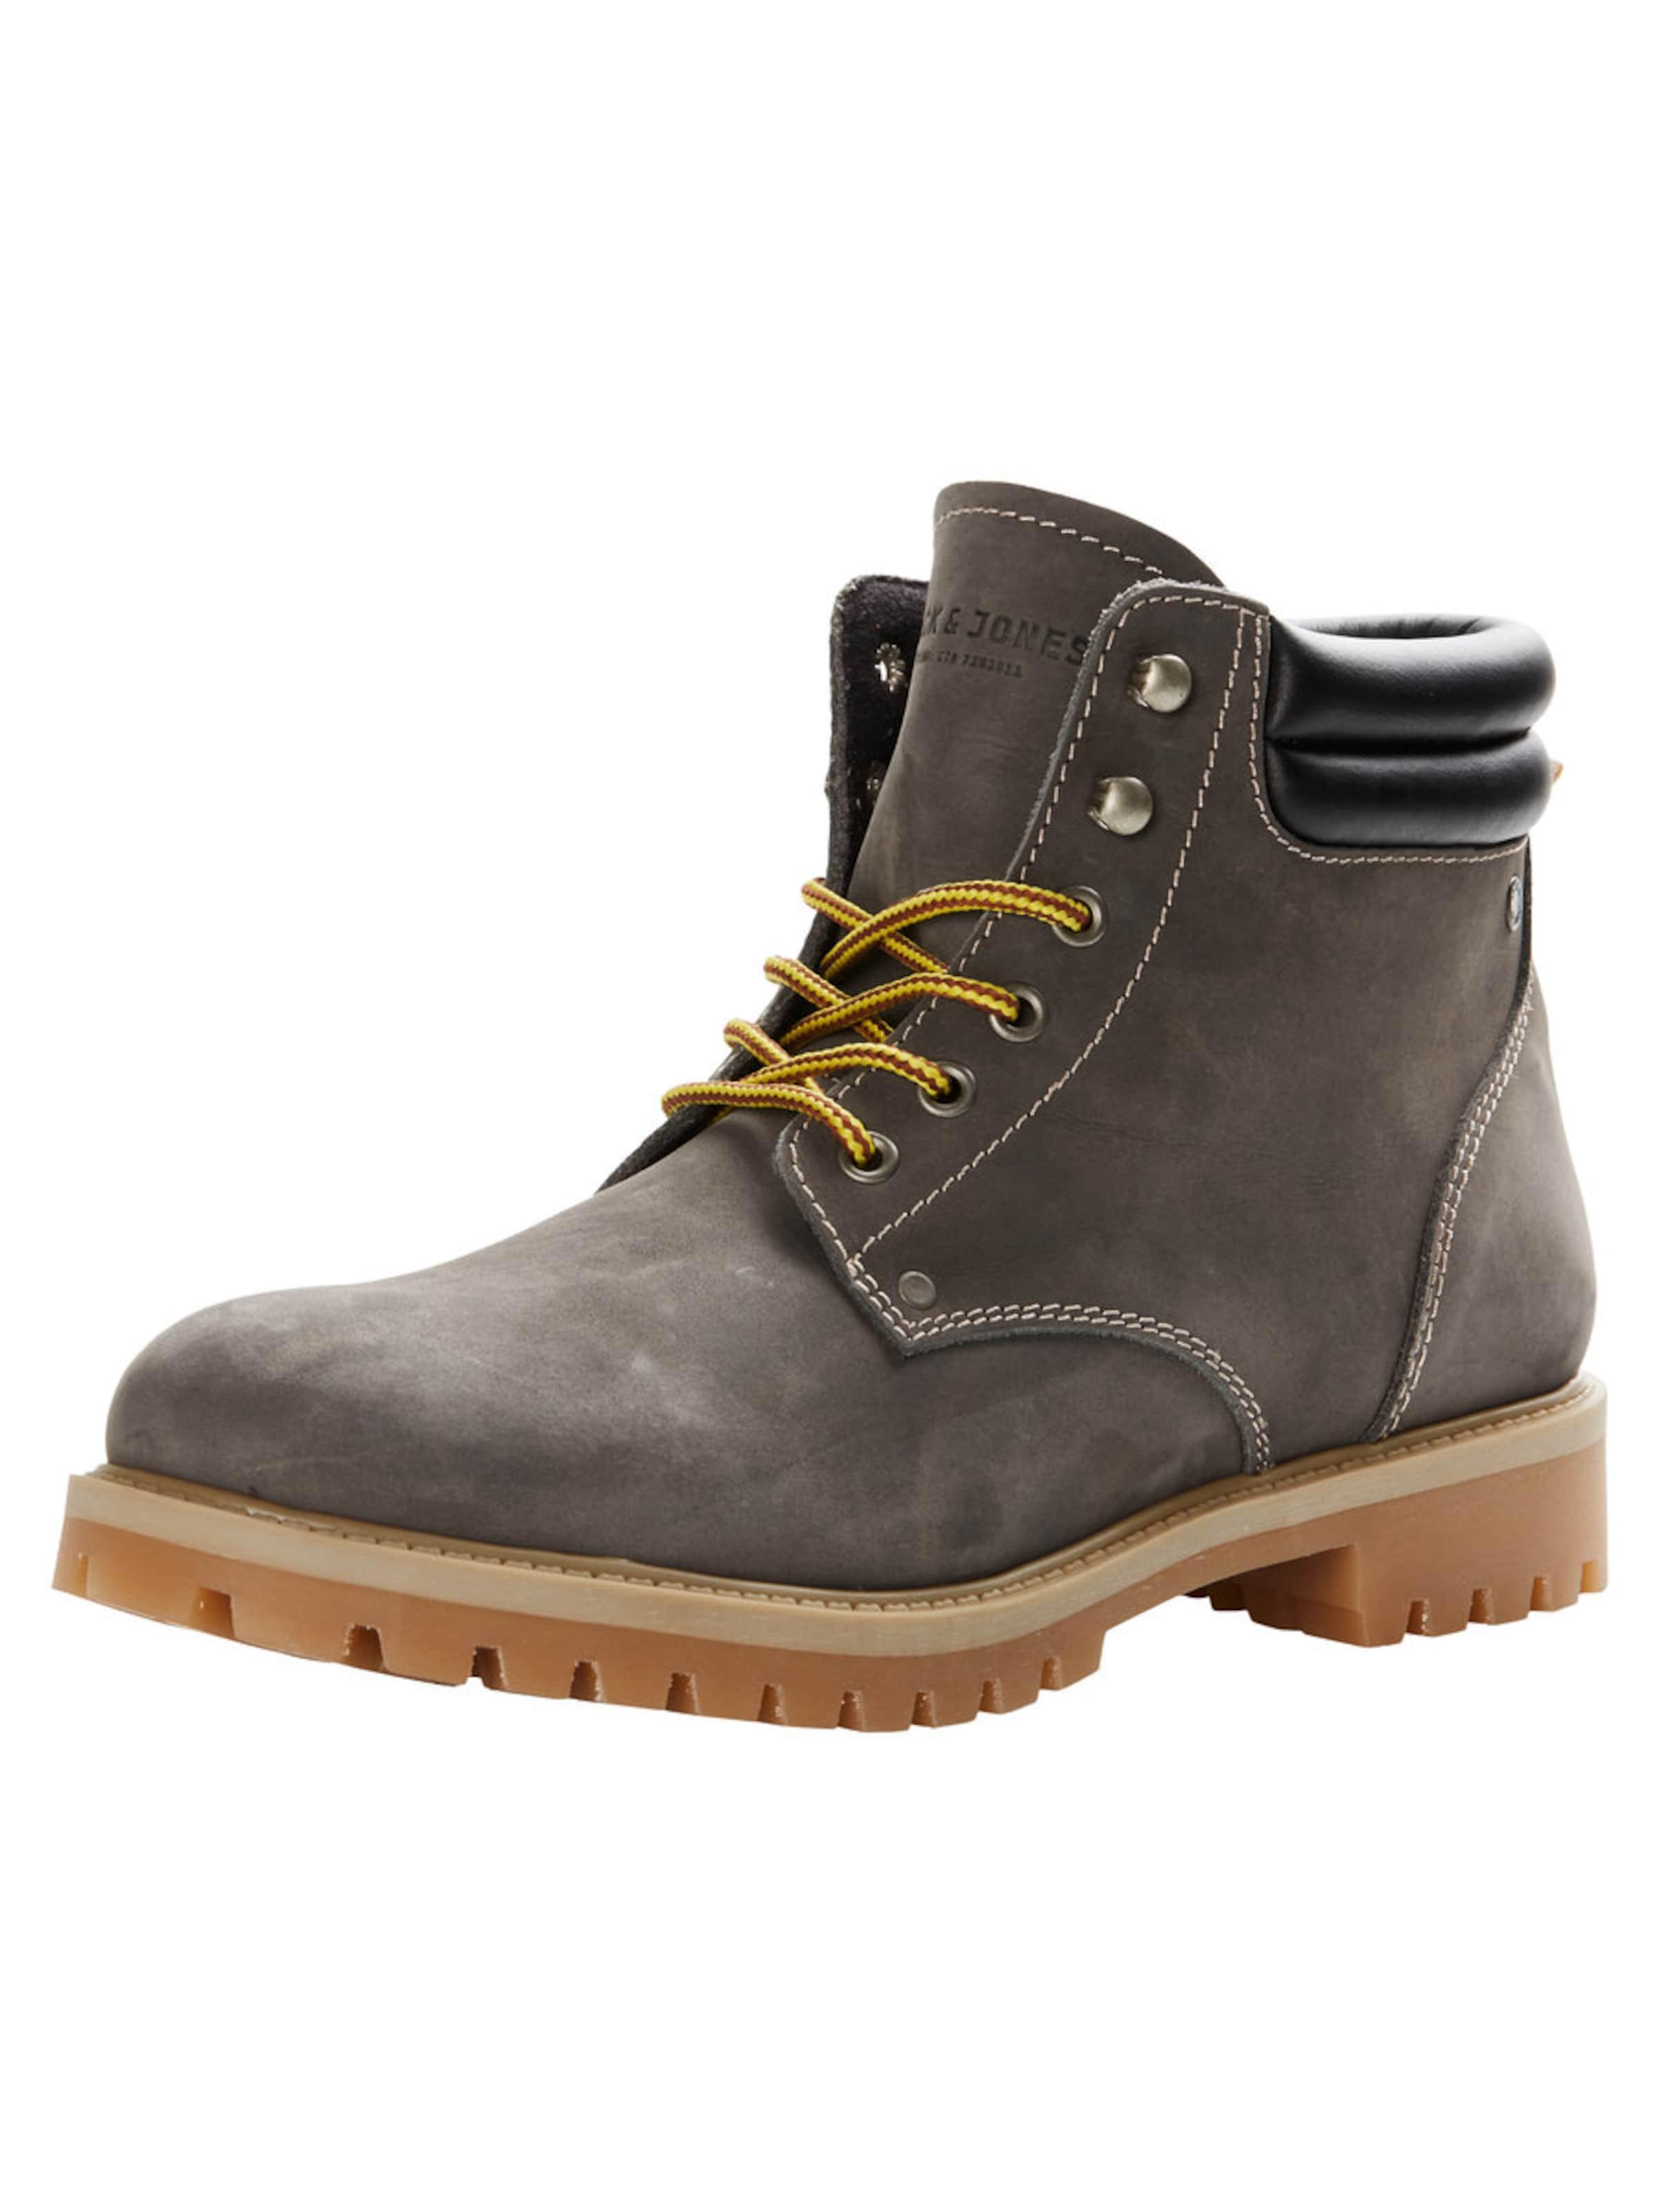 JACK & JONES Workwear-Stiefel Verschleißfeste billige Schuhe